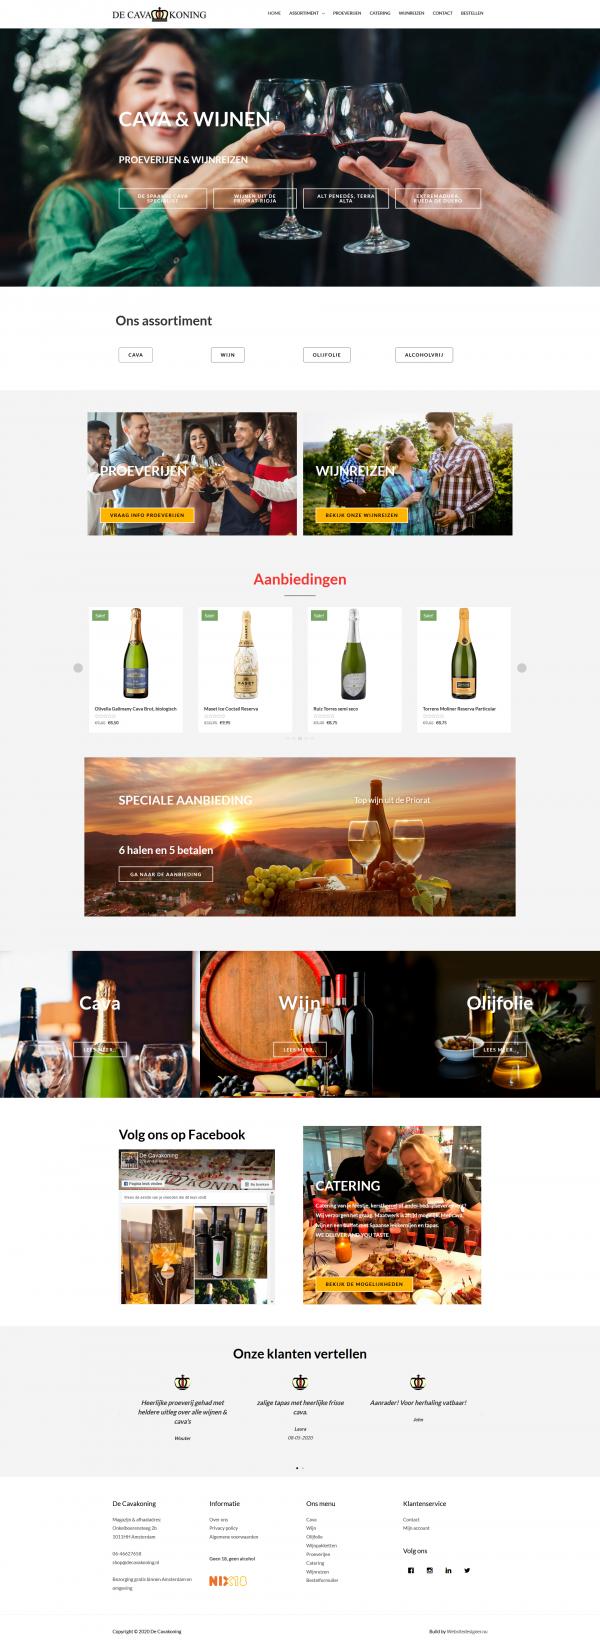 seo-specialist_Wageningen_Websitedesigner.nu_11.jpg